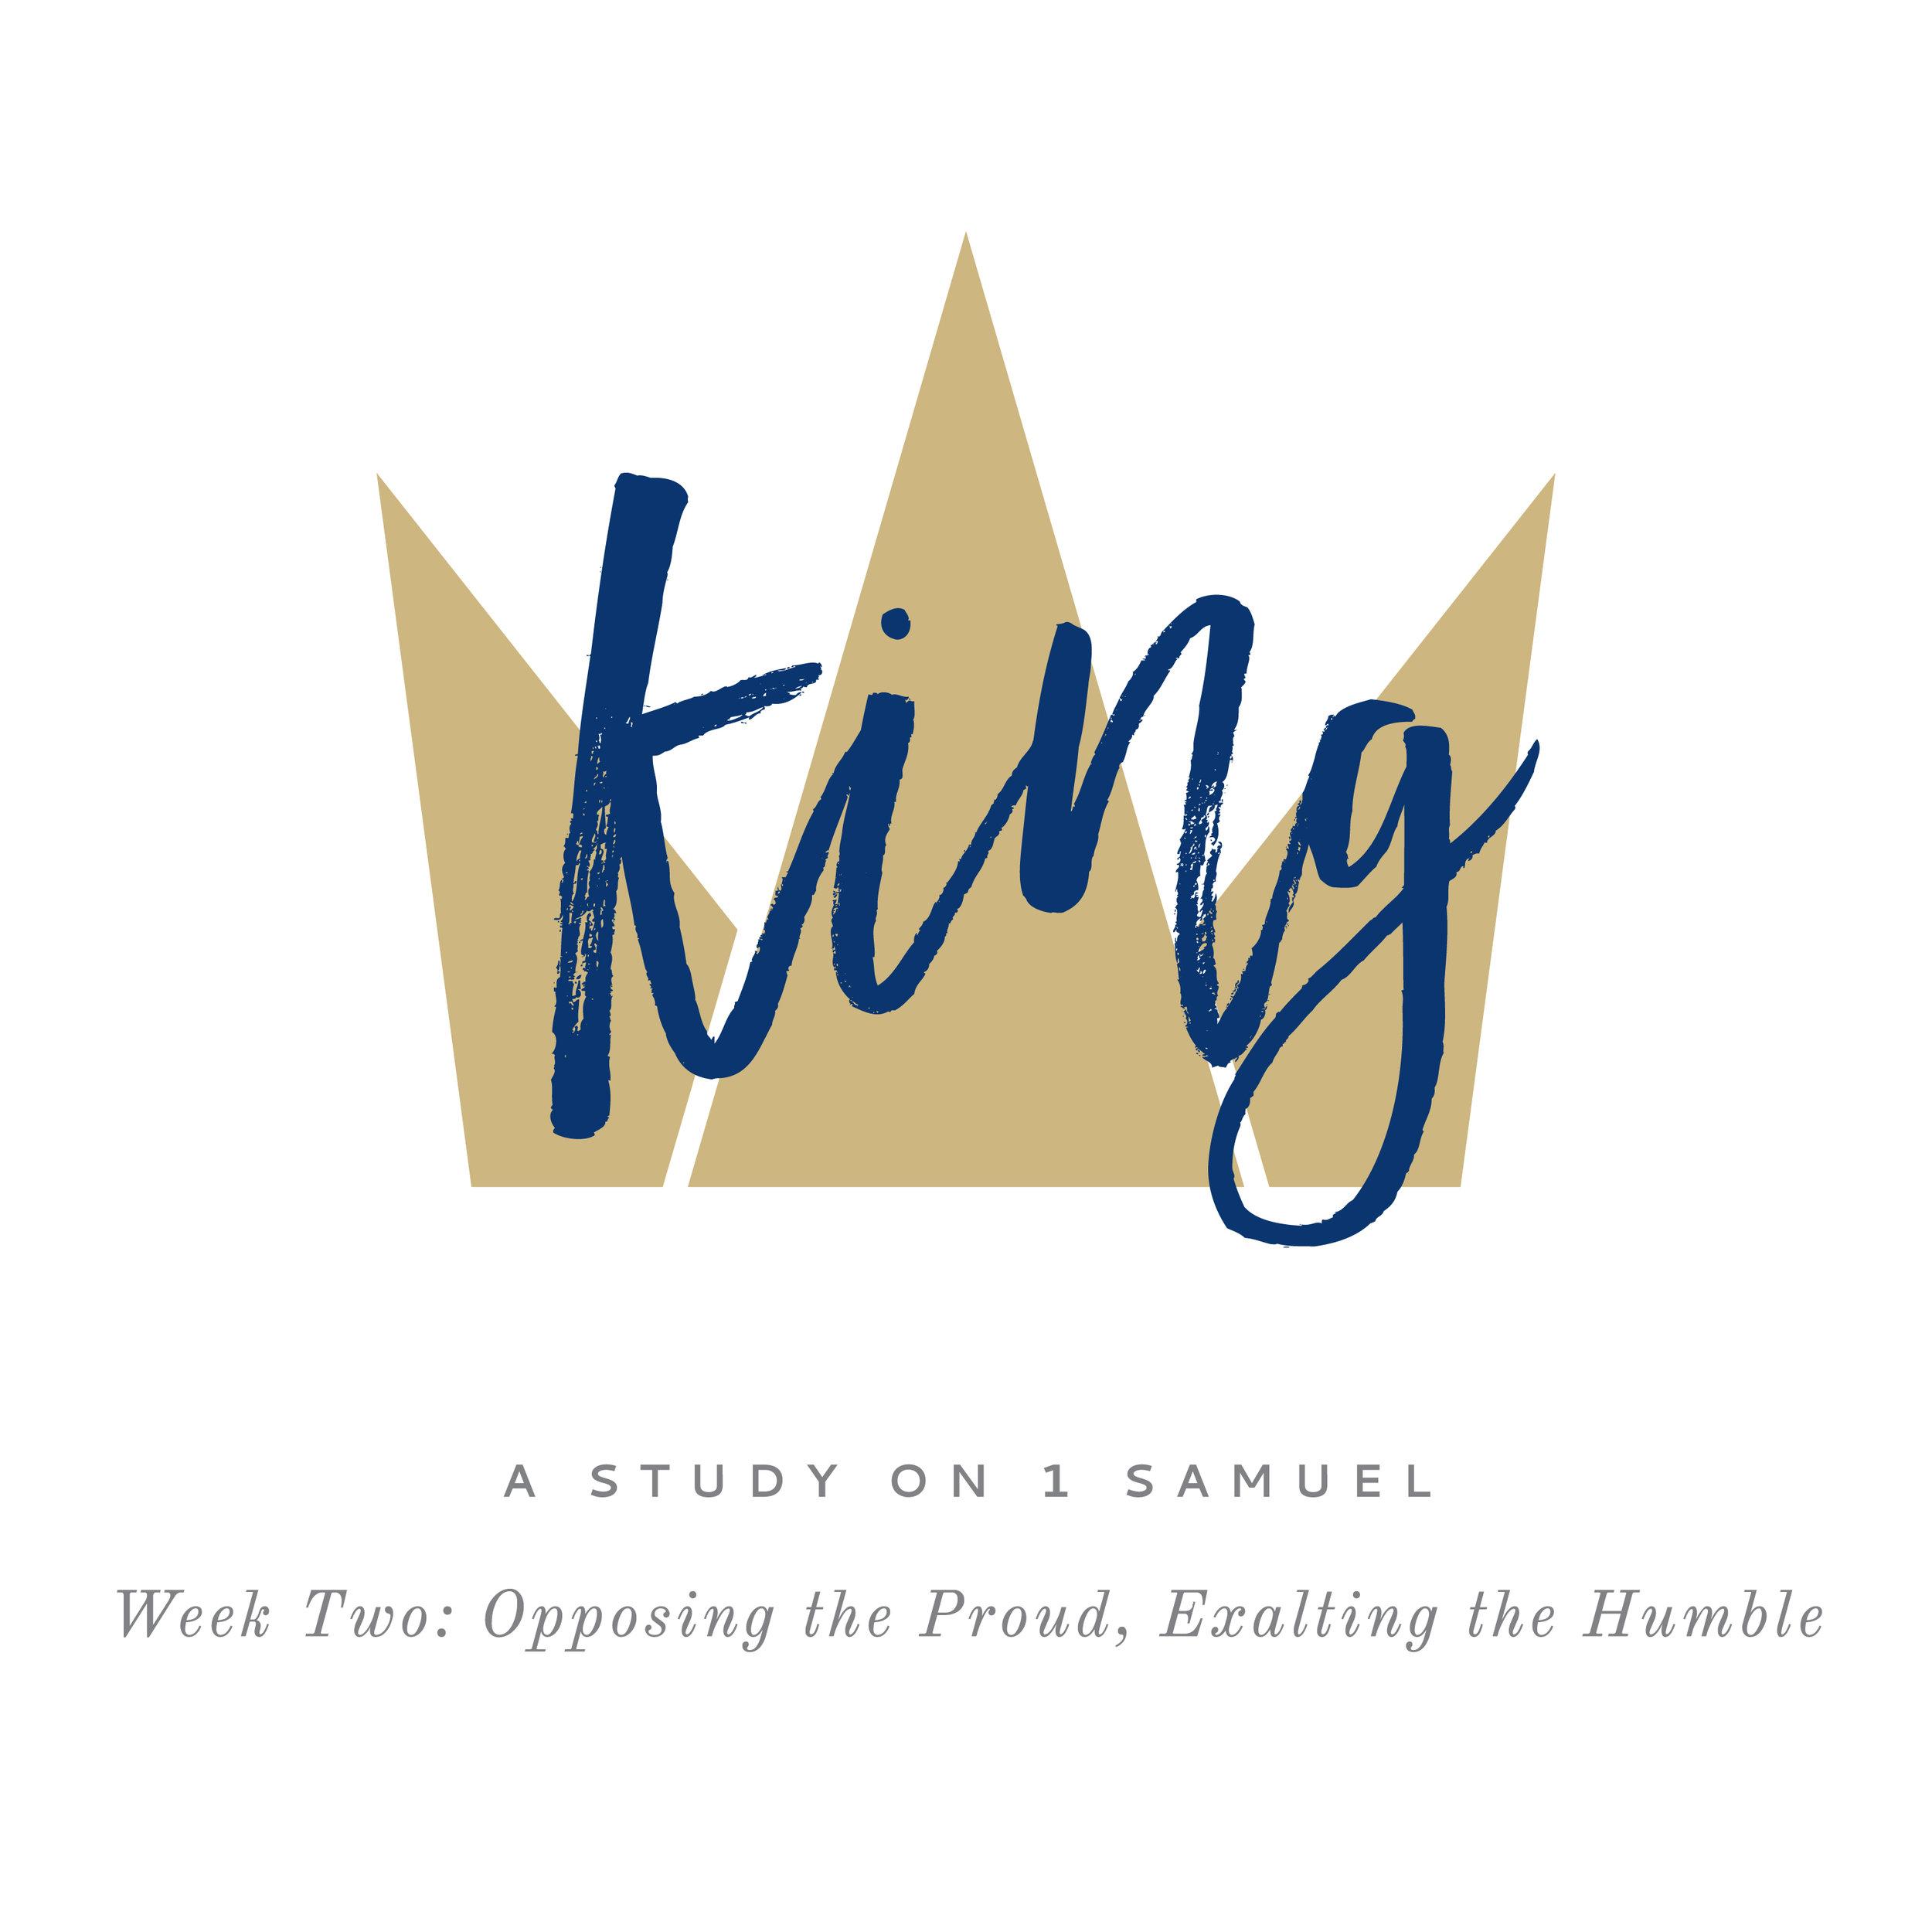 King (1 Samuel) Week 2